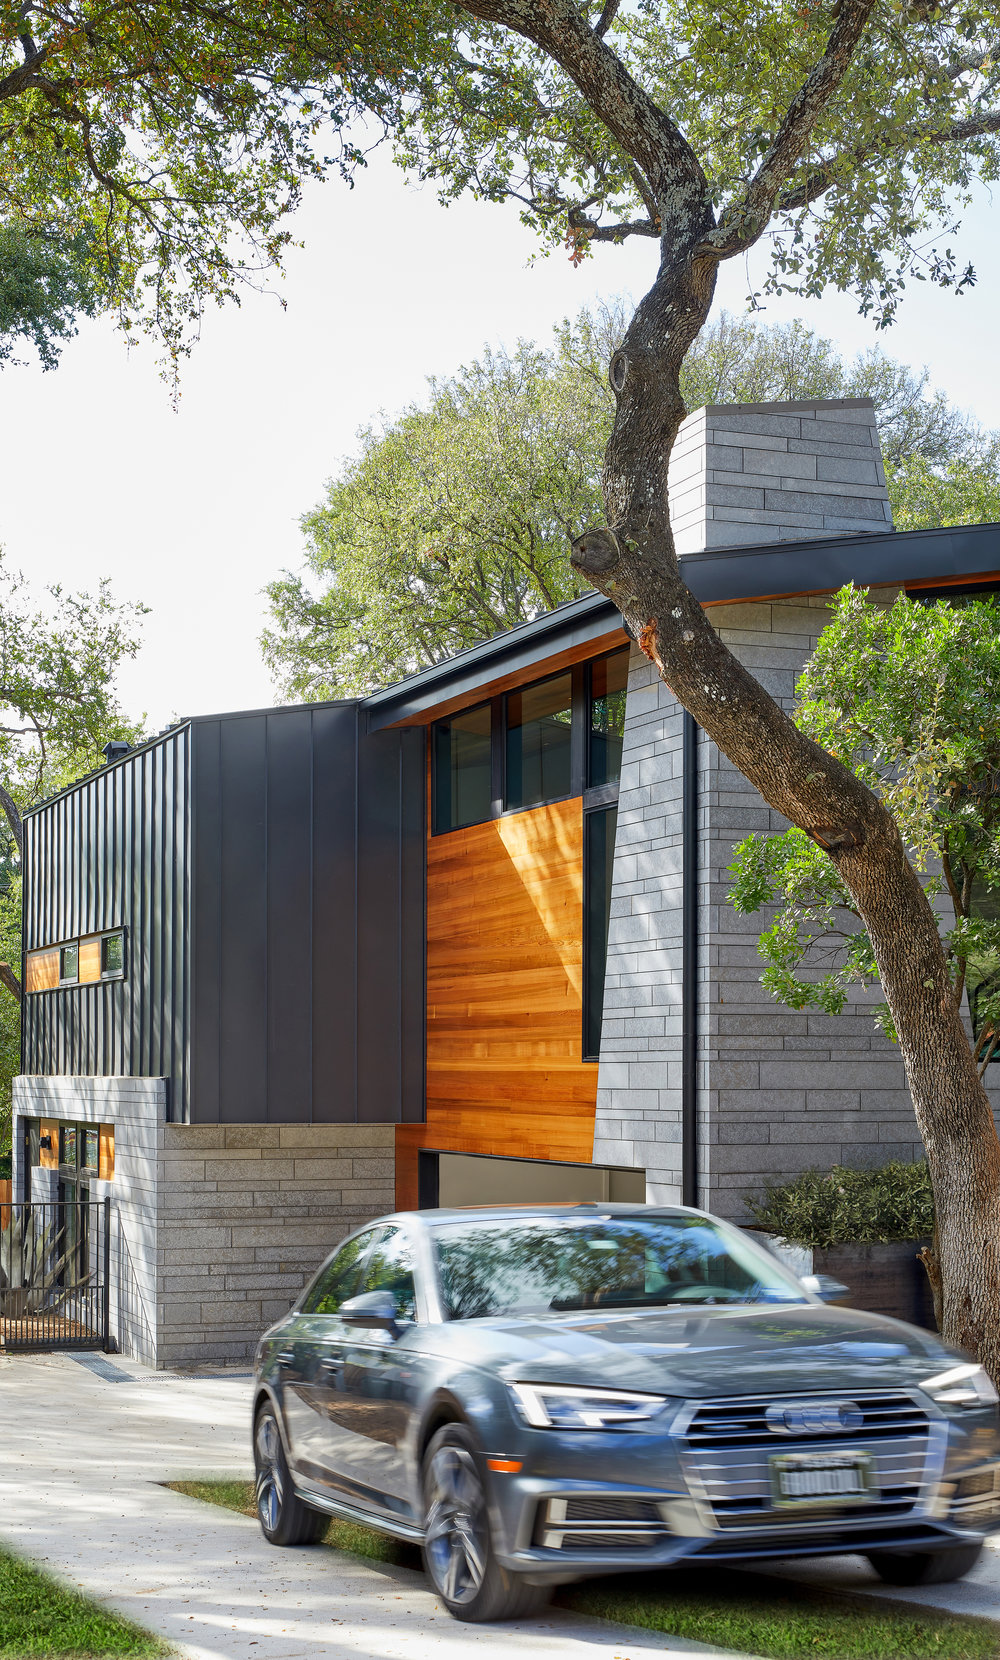 19-Ridgewood Residence by Matt Fajkus Architecture. Photo by Leonid Furmansky.jpg